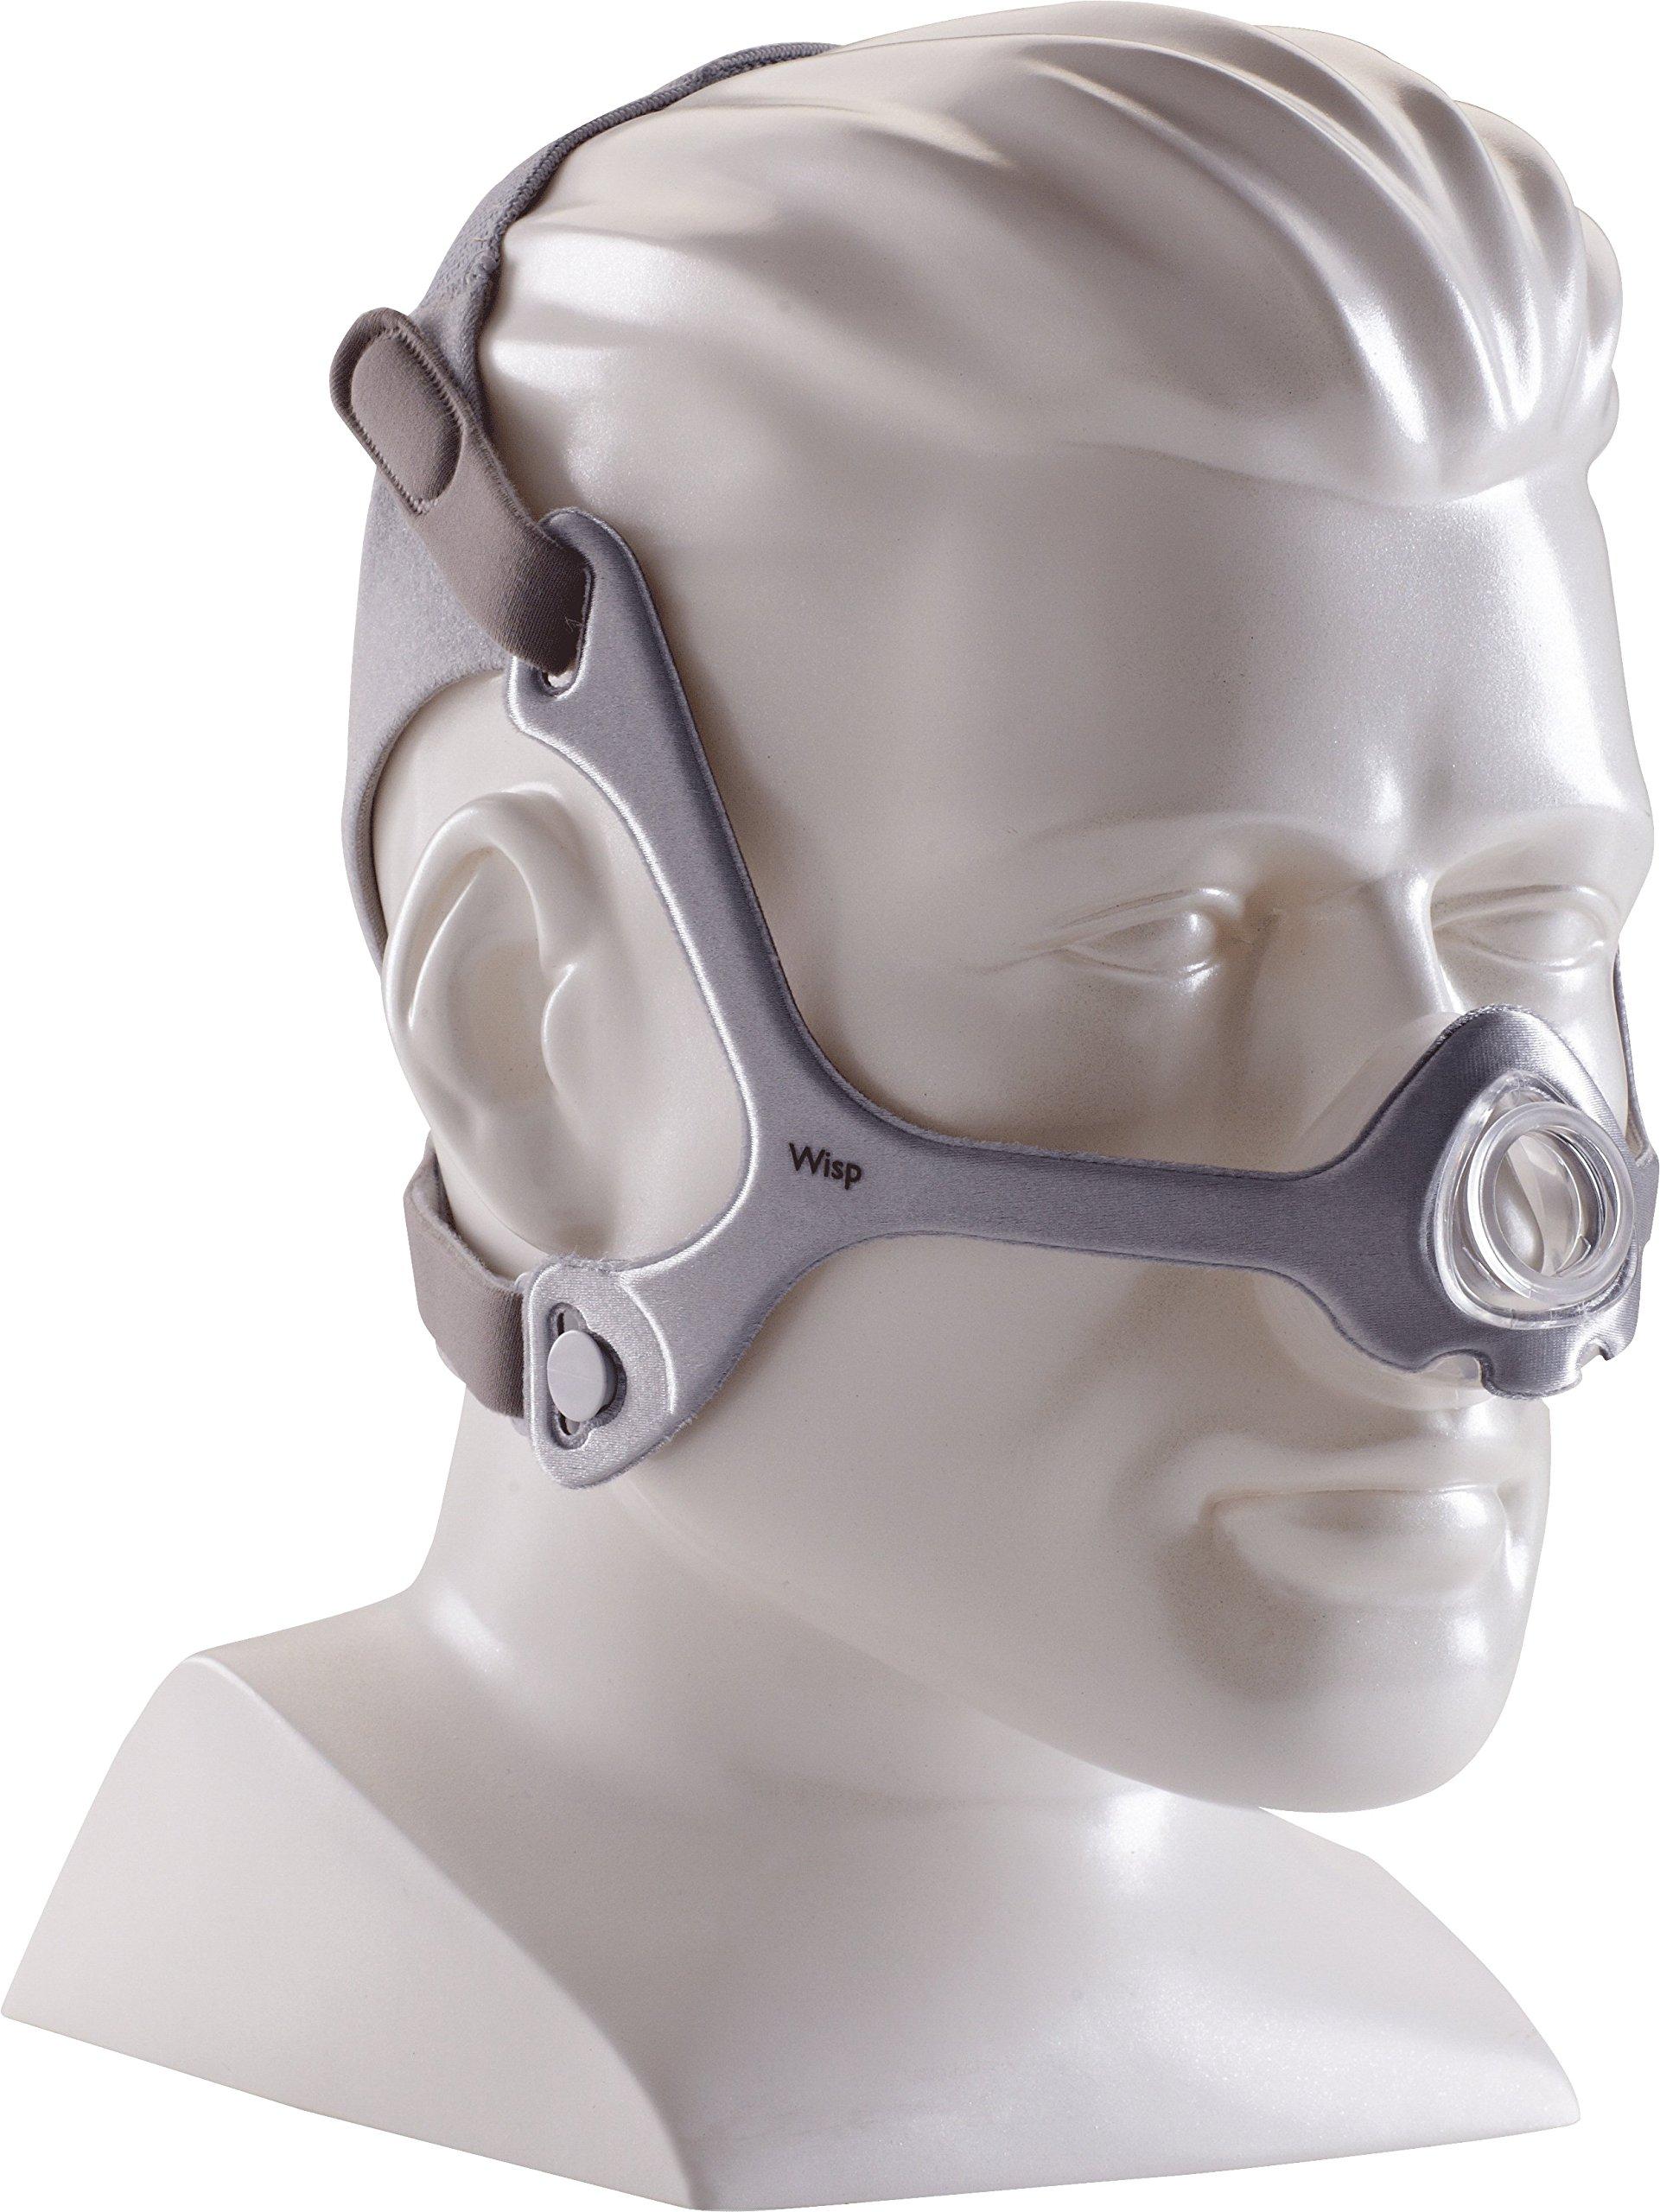 Wisp Replacement Headgear